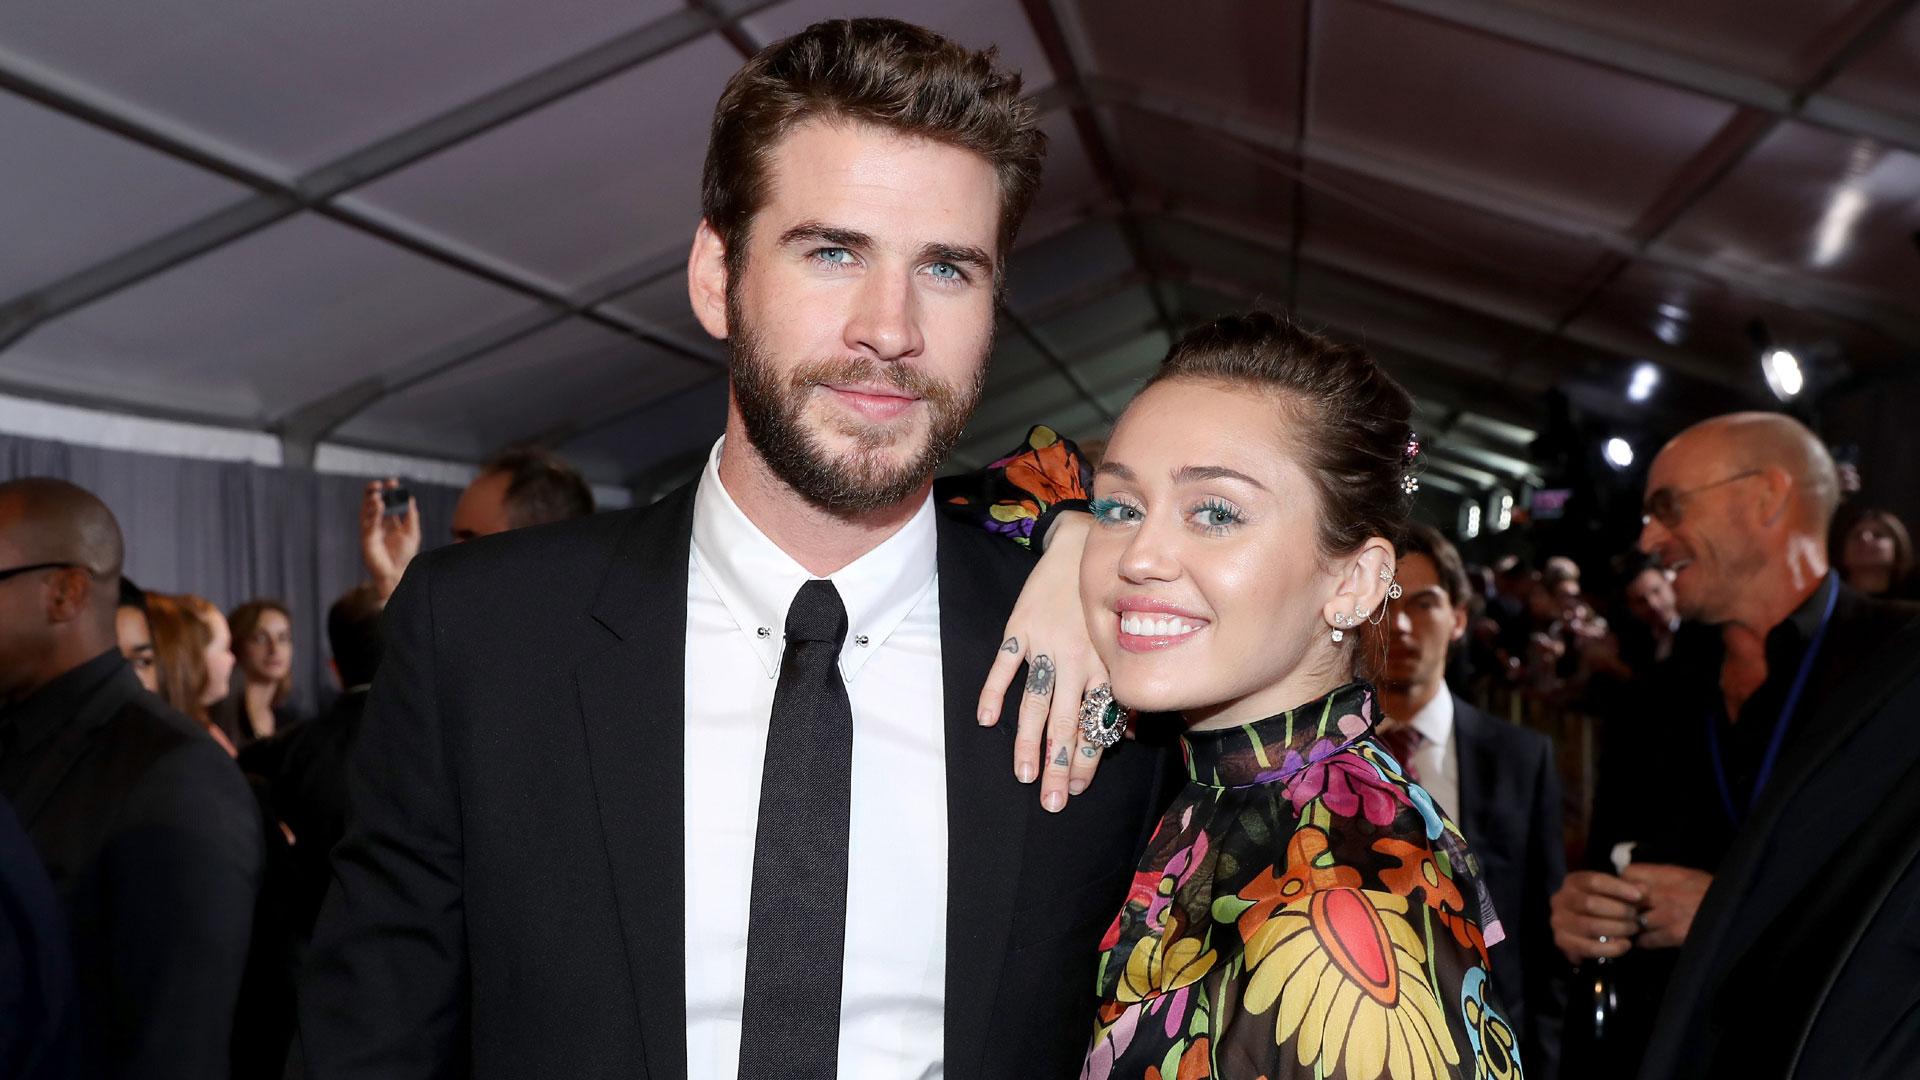 Liam Hemsworth, Miley Cyrus at Thor Ragnorak premiere29831137-159532